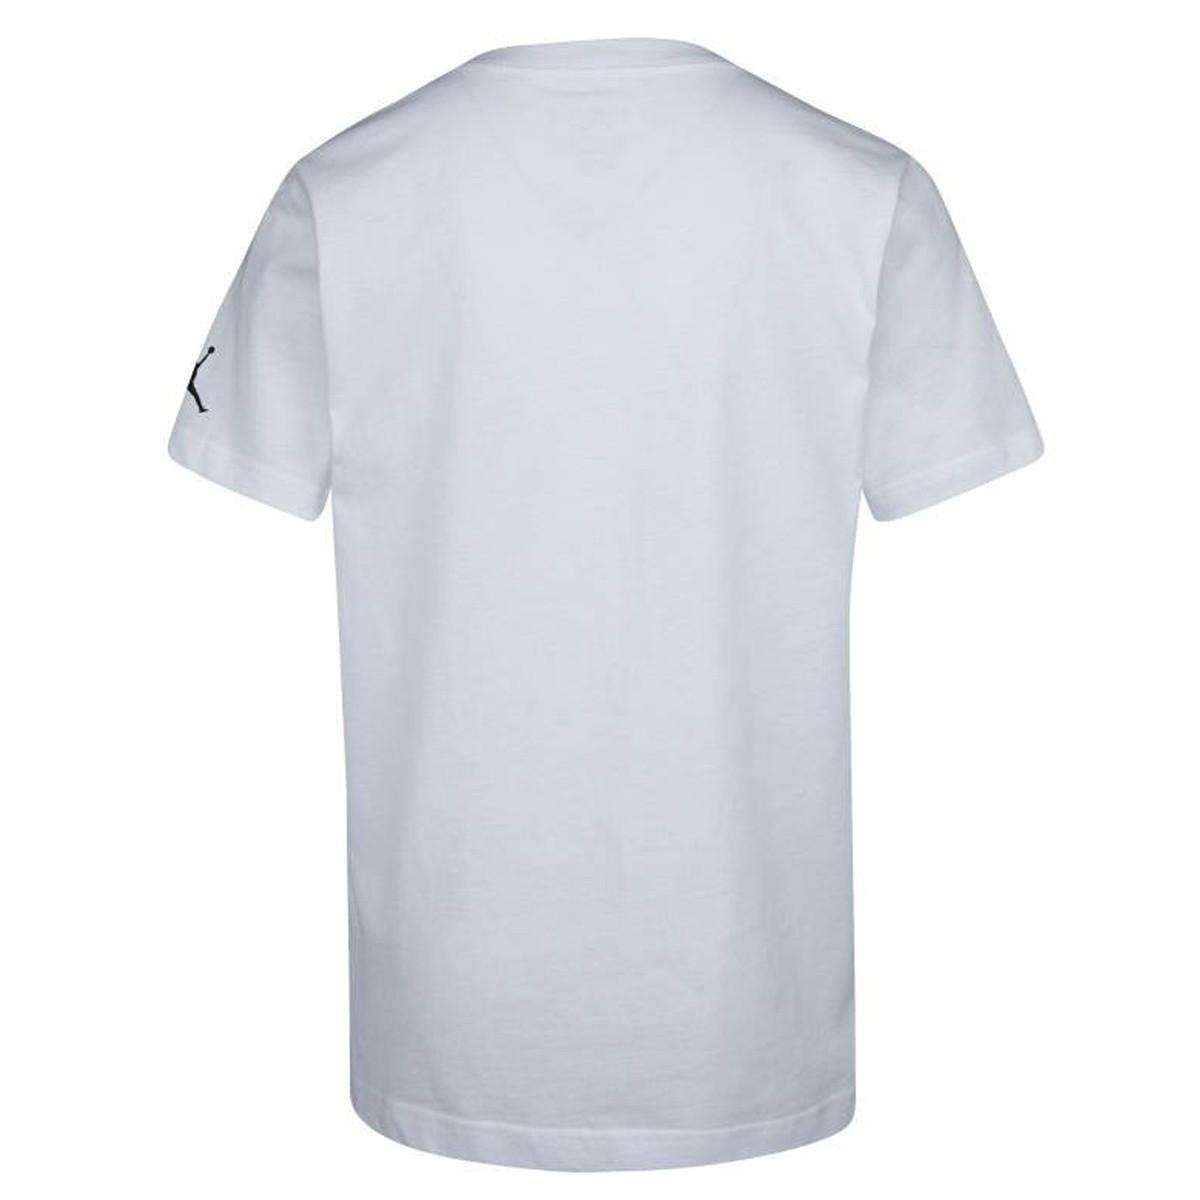 Camiseta Jordan Brand Graphic Crew 1 'White'-957295-001